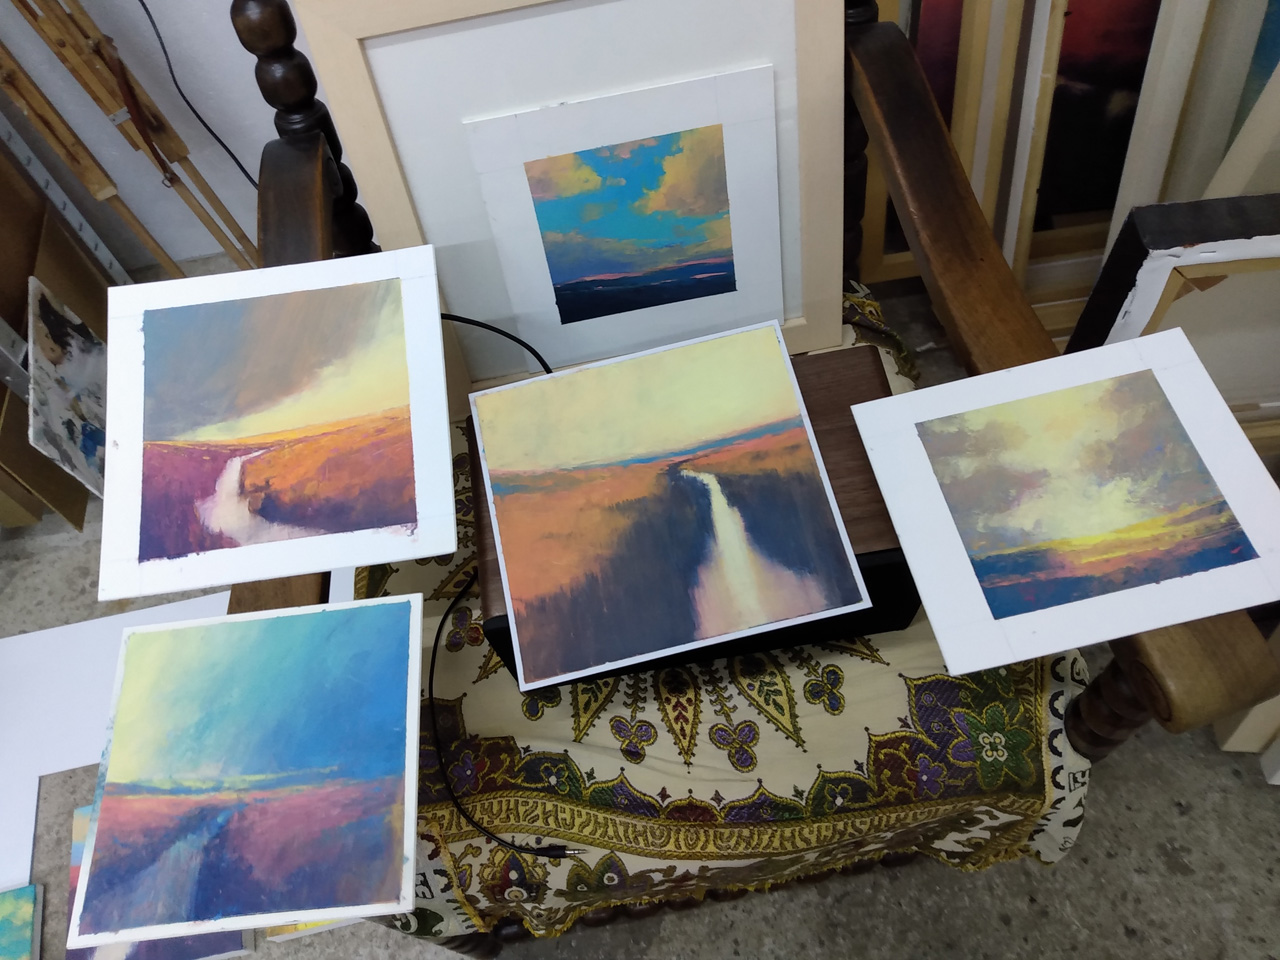 Lightfall paintings